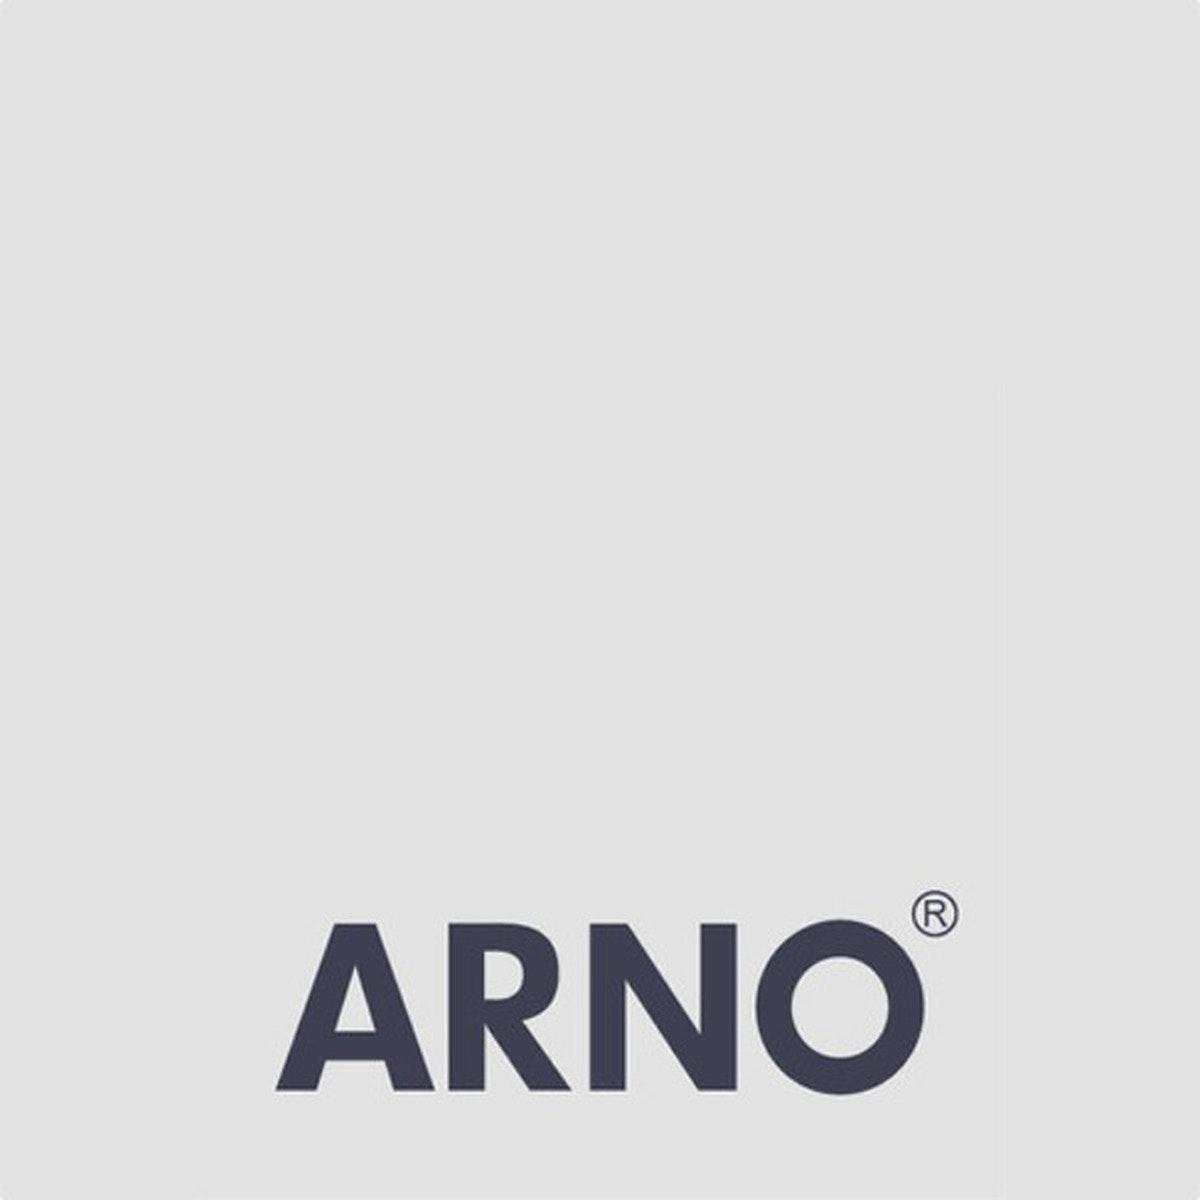 ARNO GmbH